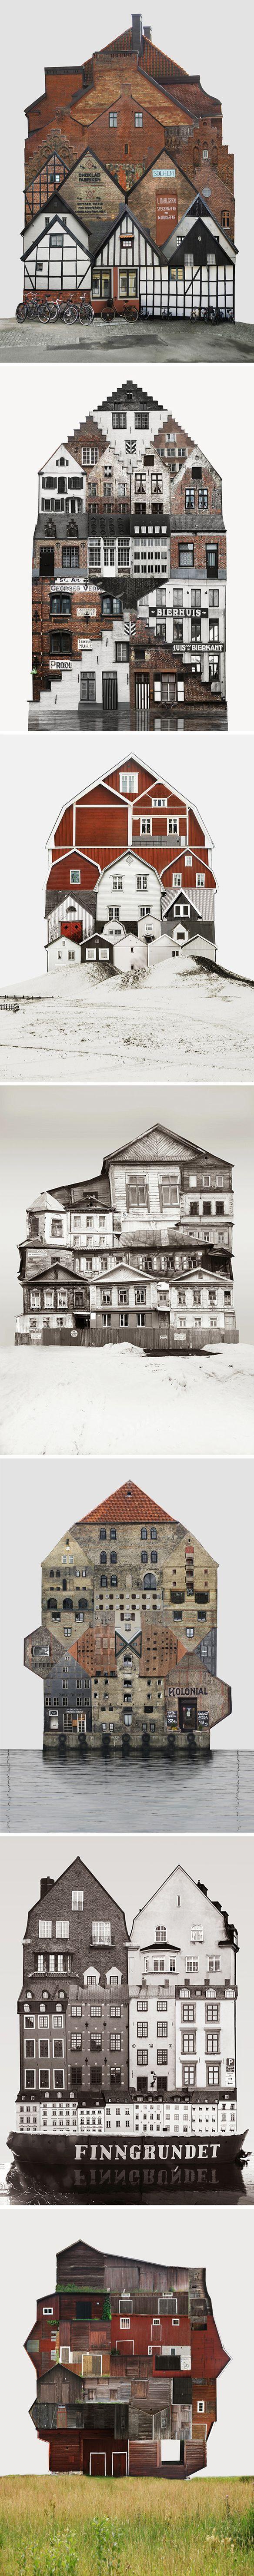 Anastasia Savinova #collage #architecture